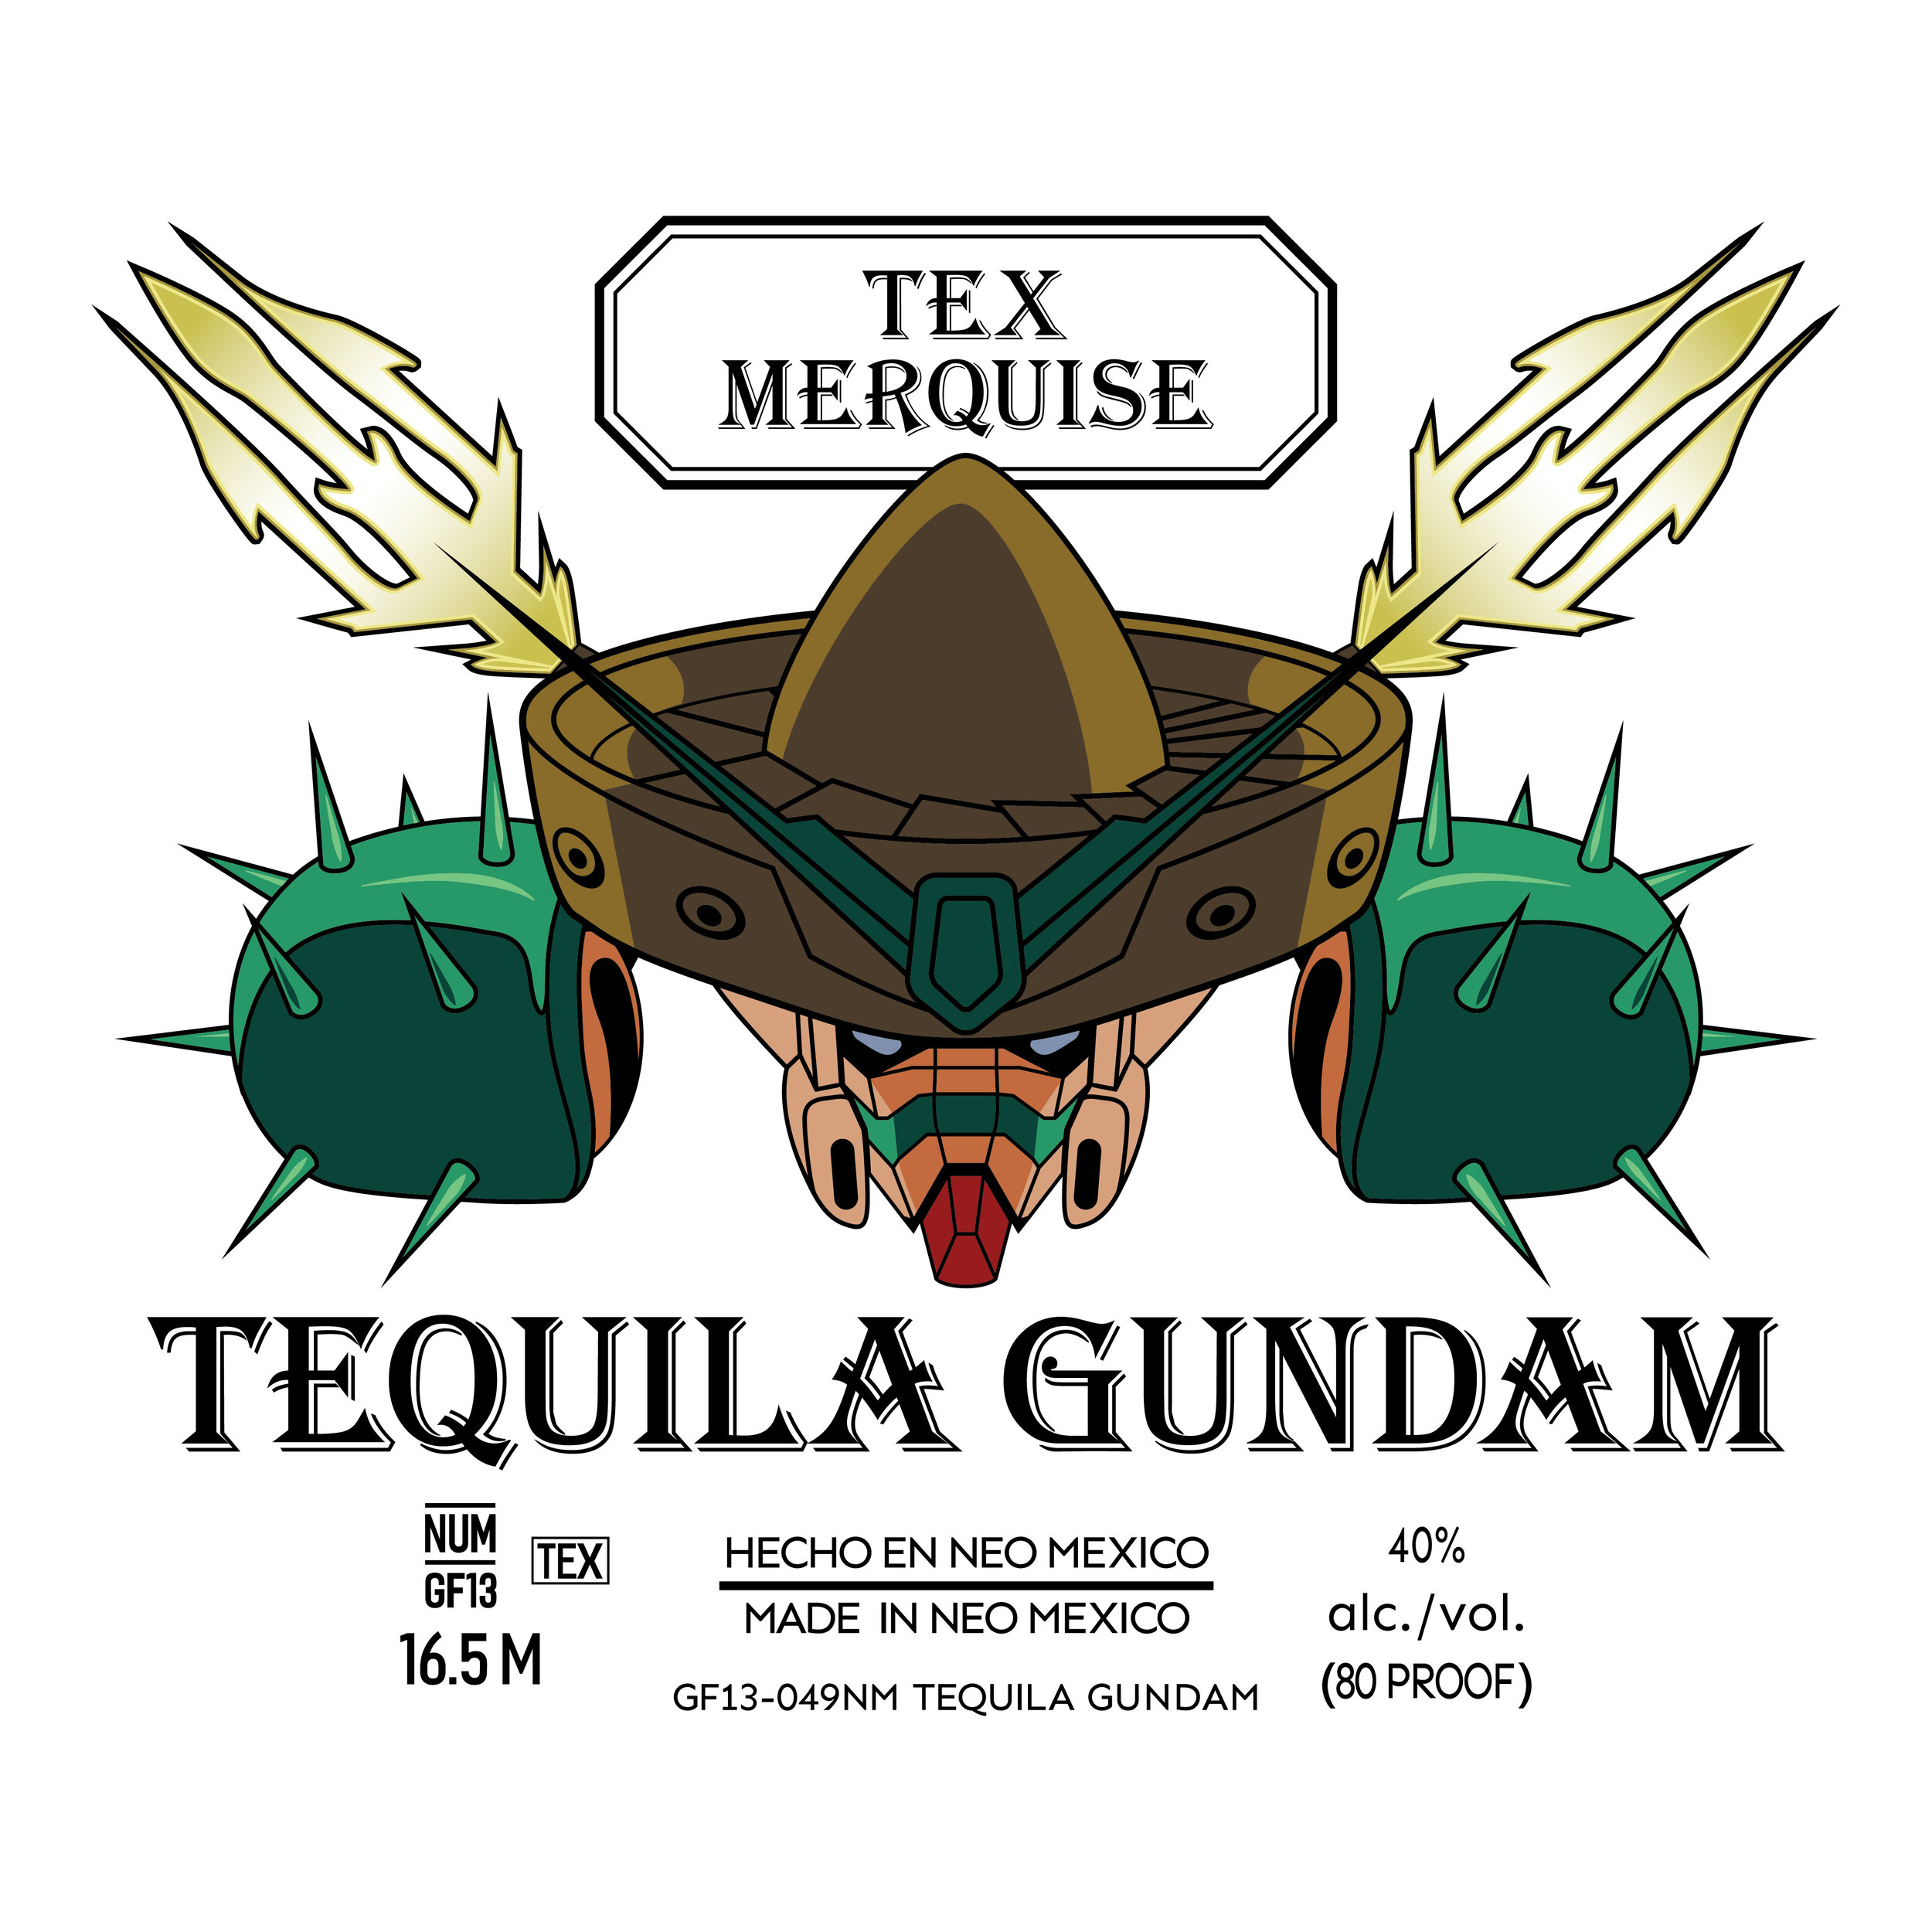 Tequila Gundam Alternate Graphic